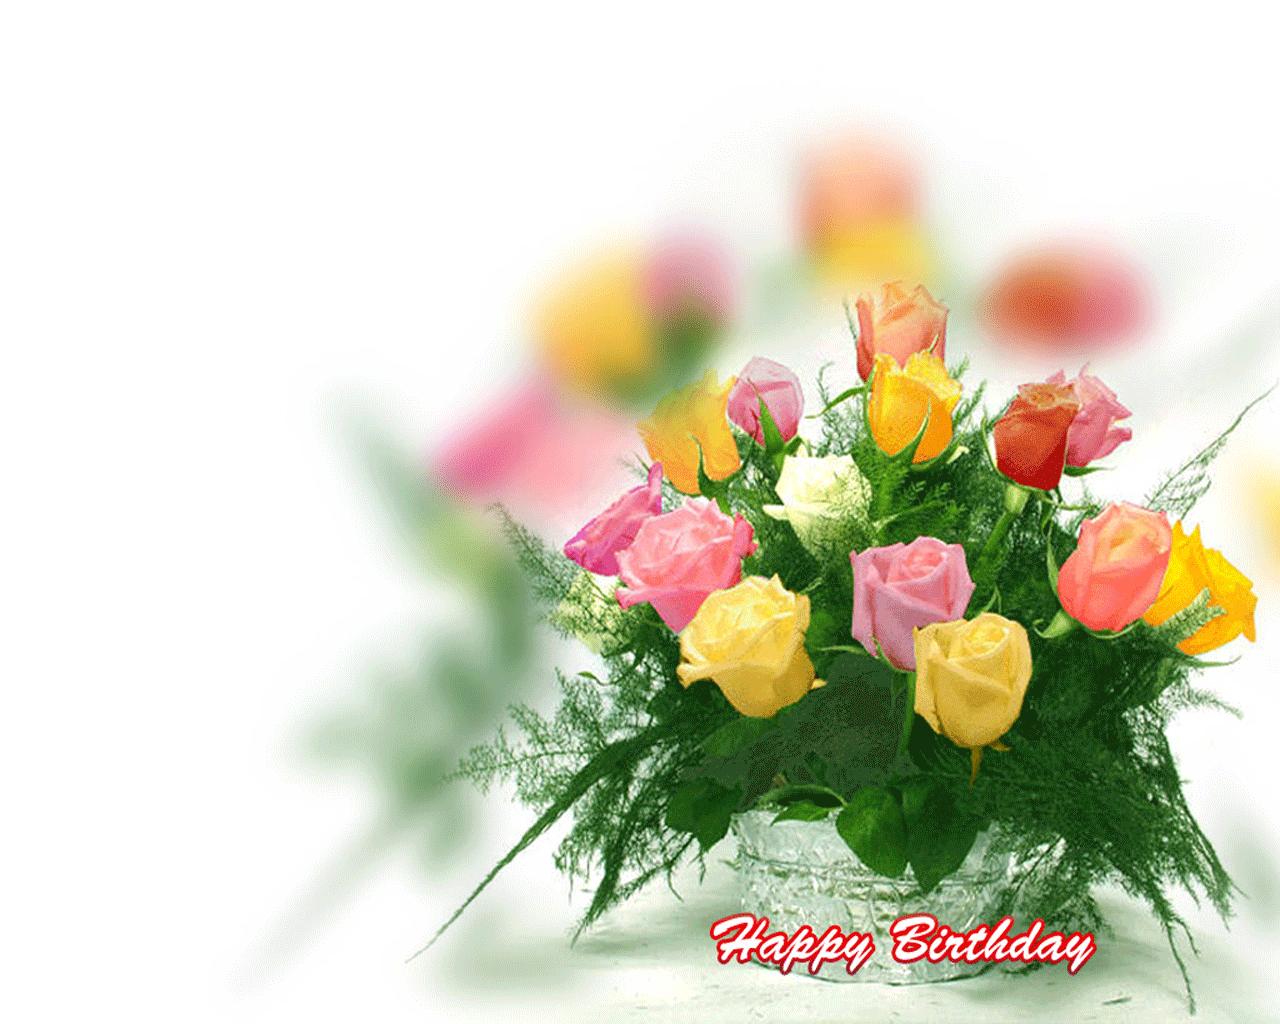 e-cards-birthday-free-1 Fantastic greeting cards for birthdays